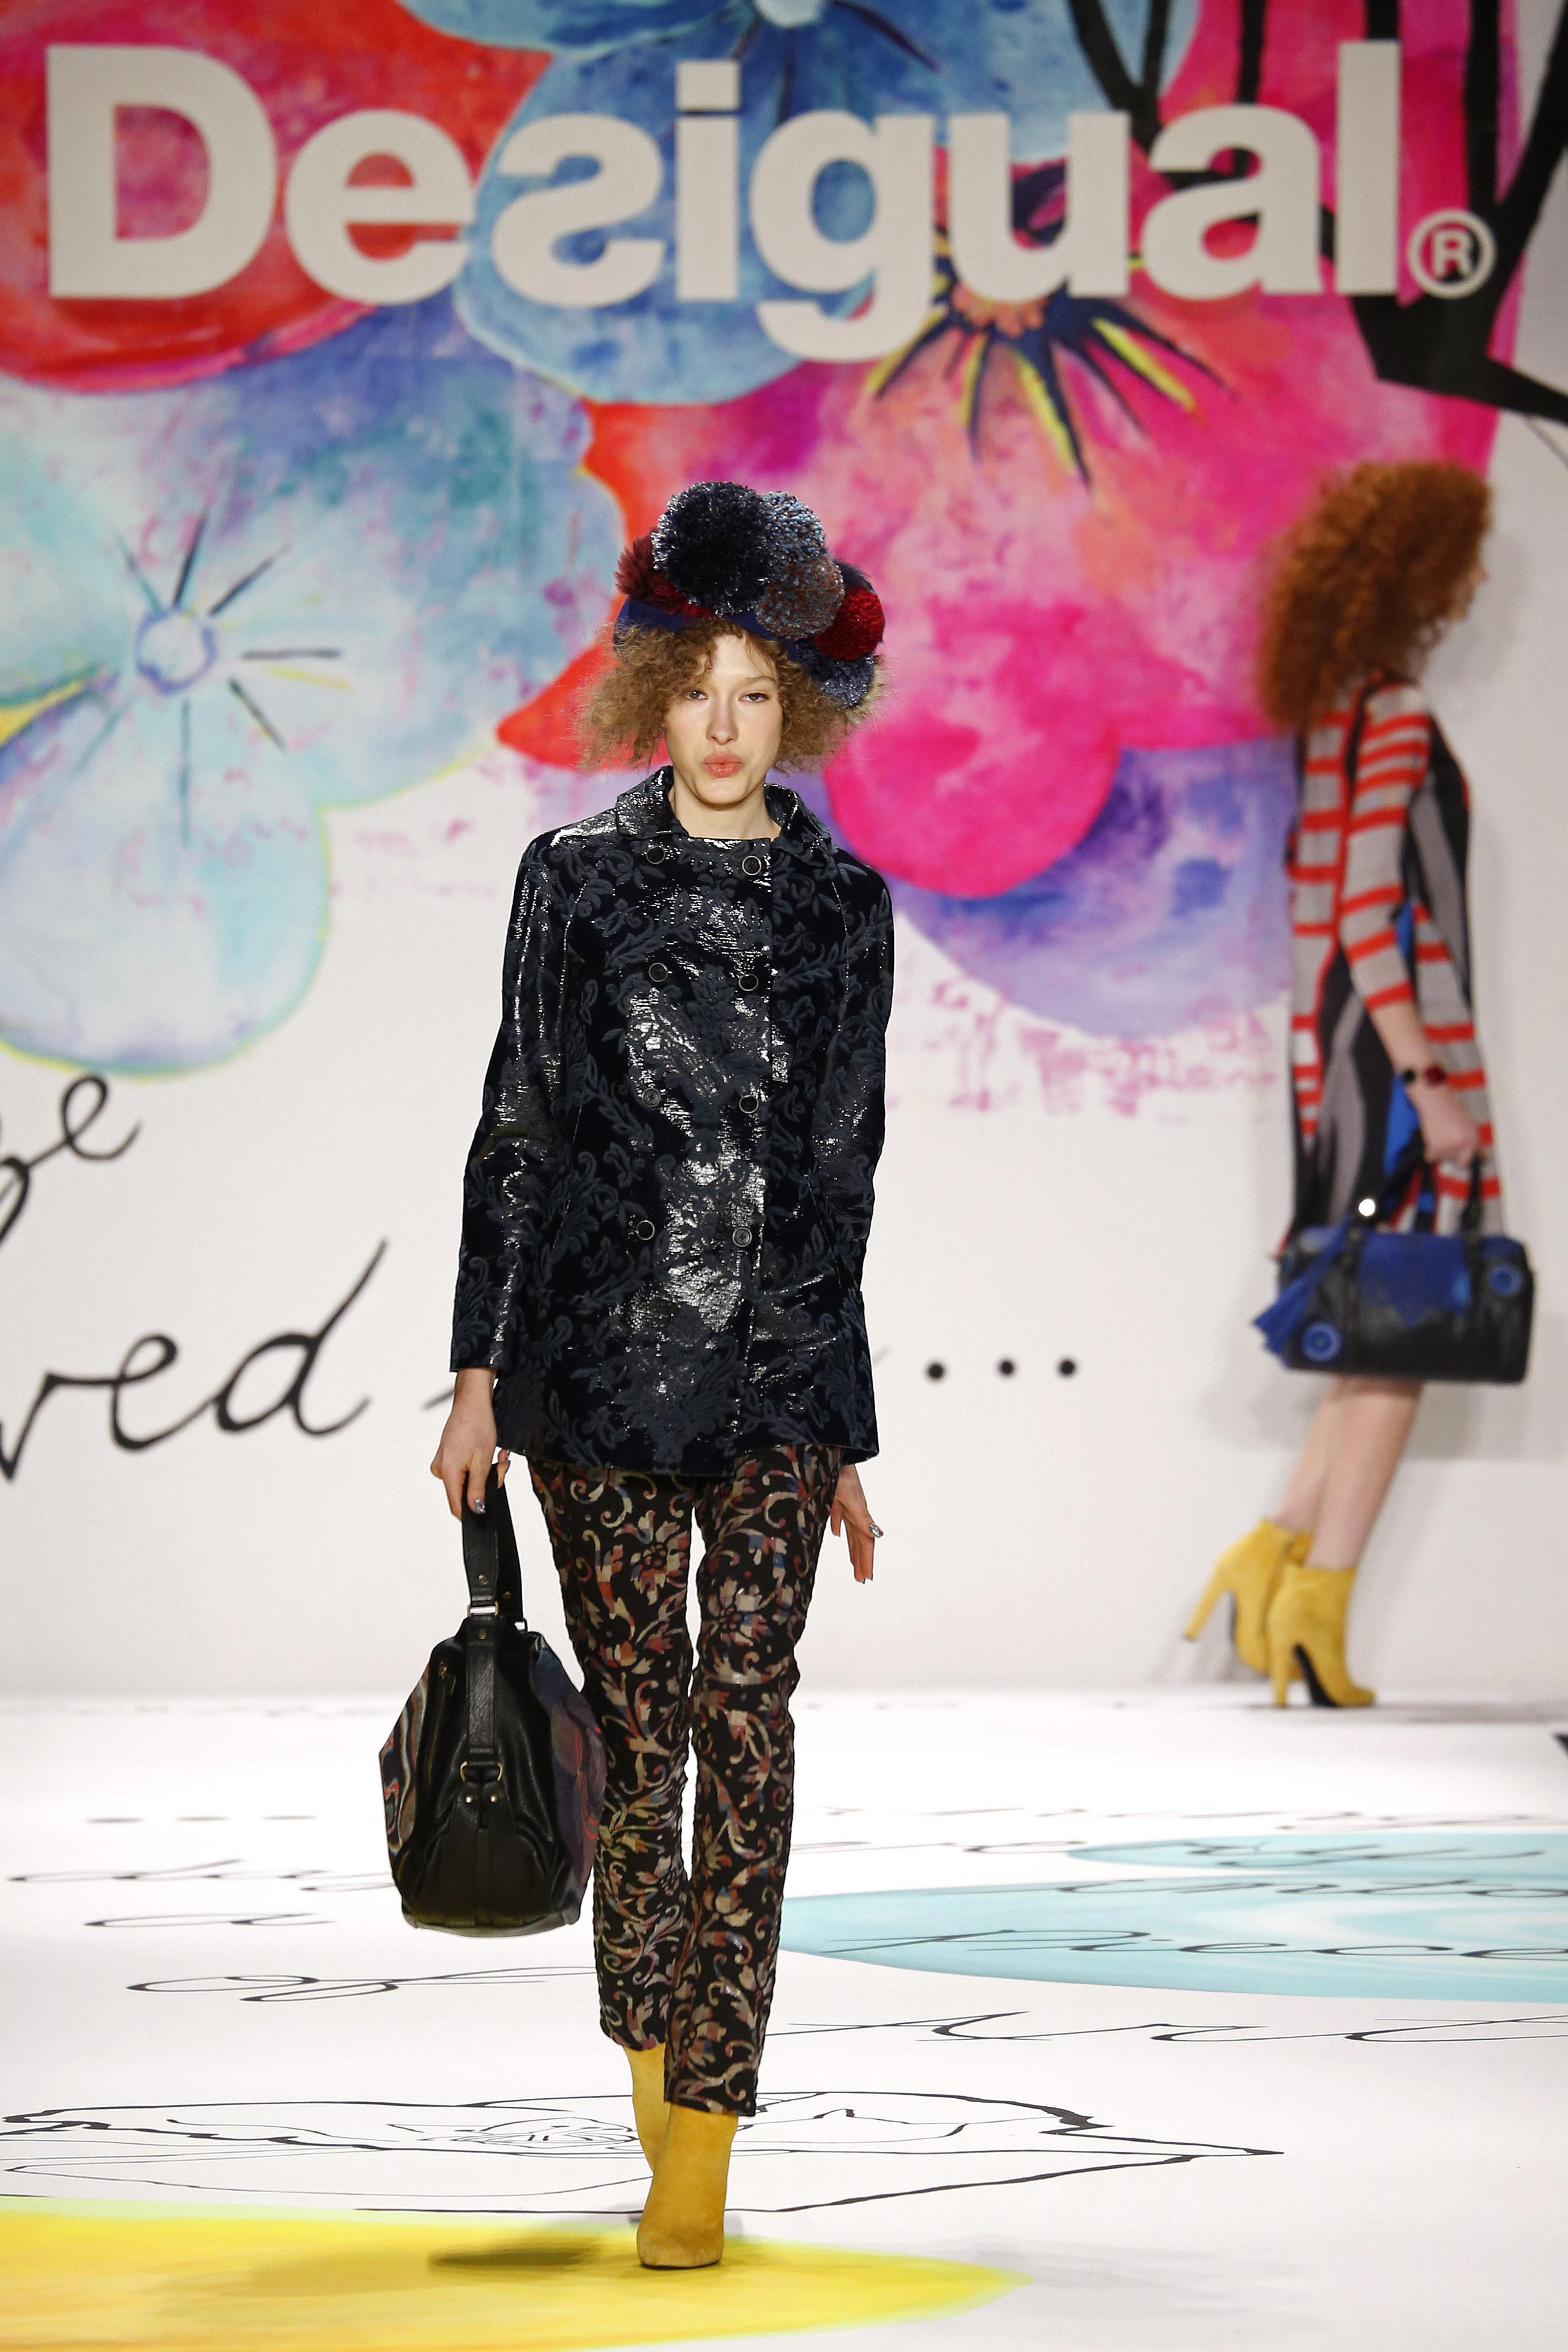 Catwalk Mercedes-Benz Fashion Week New York F/W 2015-2016